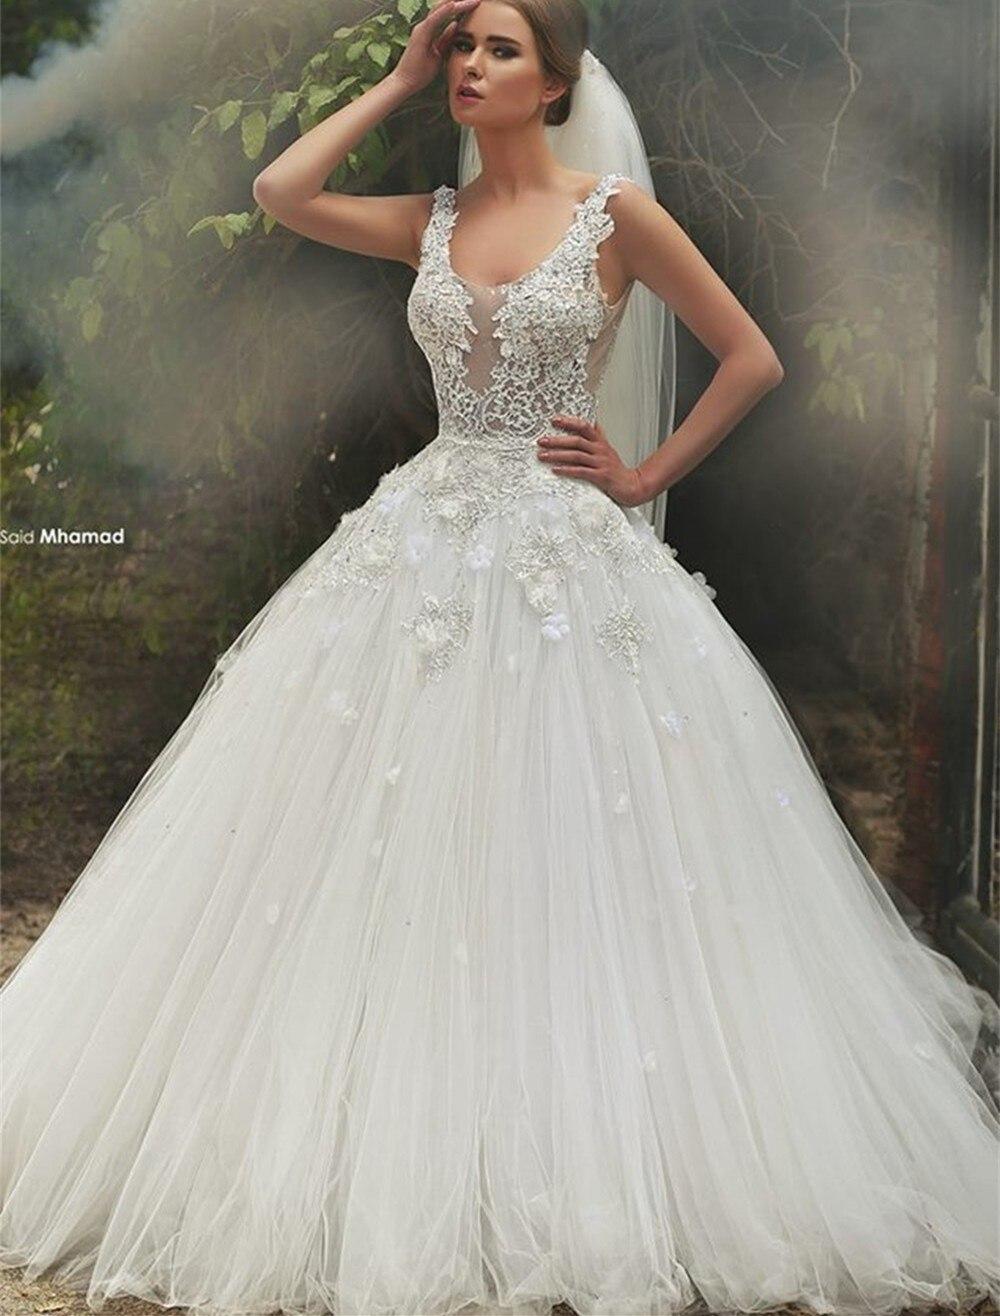 Popular Popular Bridal Gown Designers-Buy Cheap Popular Bridal ...